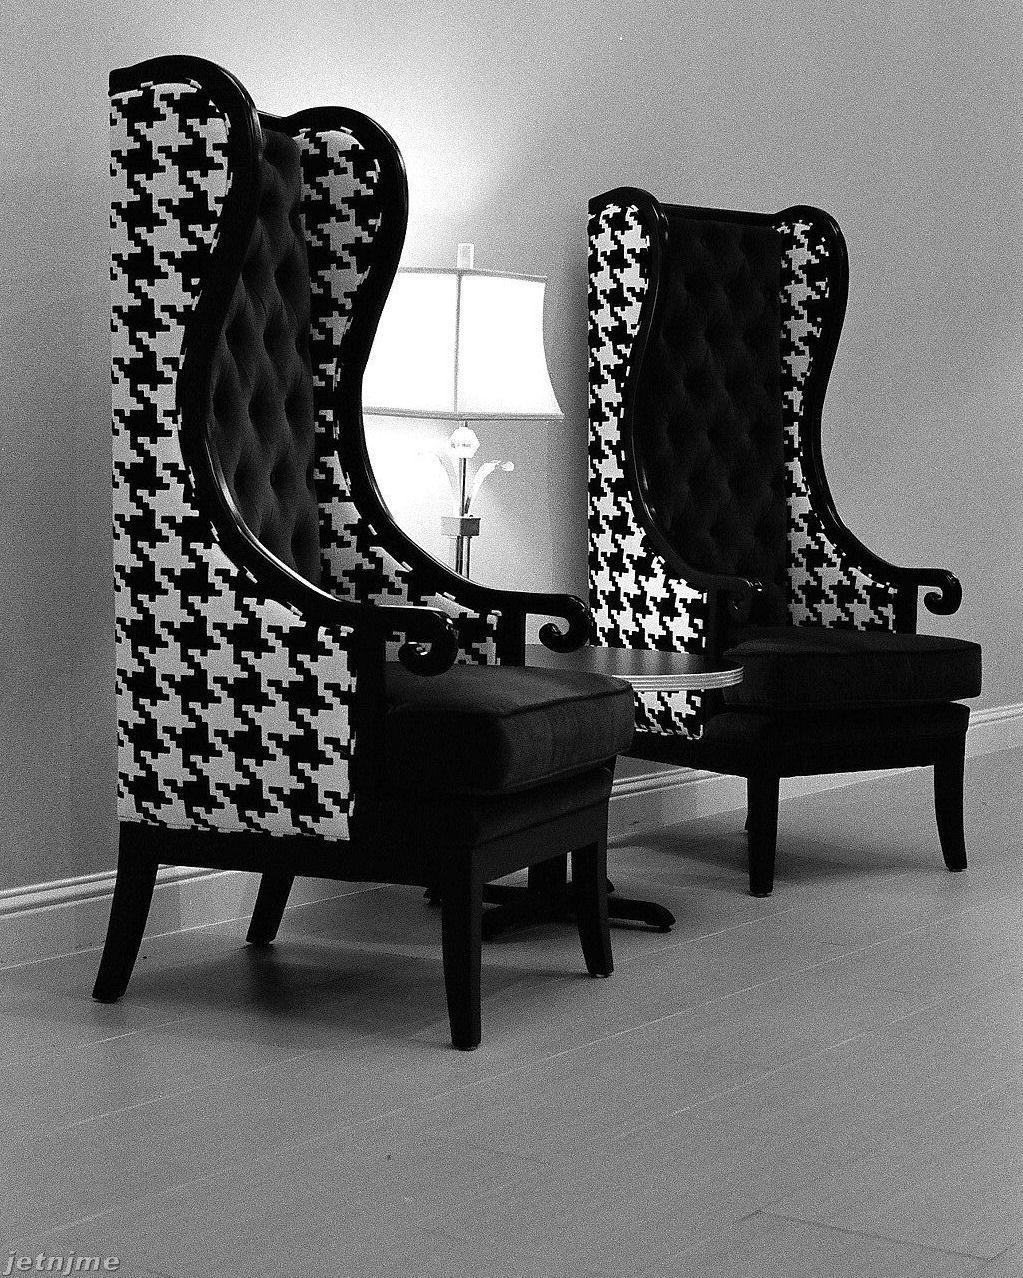 Seats at the furniture - Telas tapiceria sillas ...